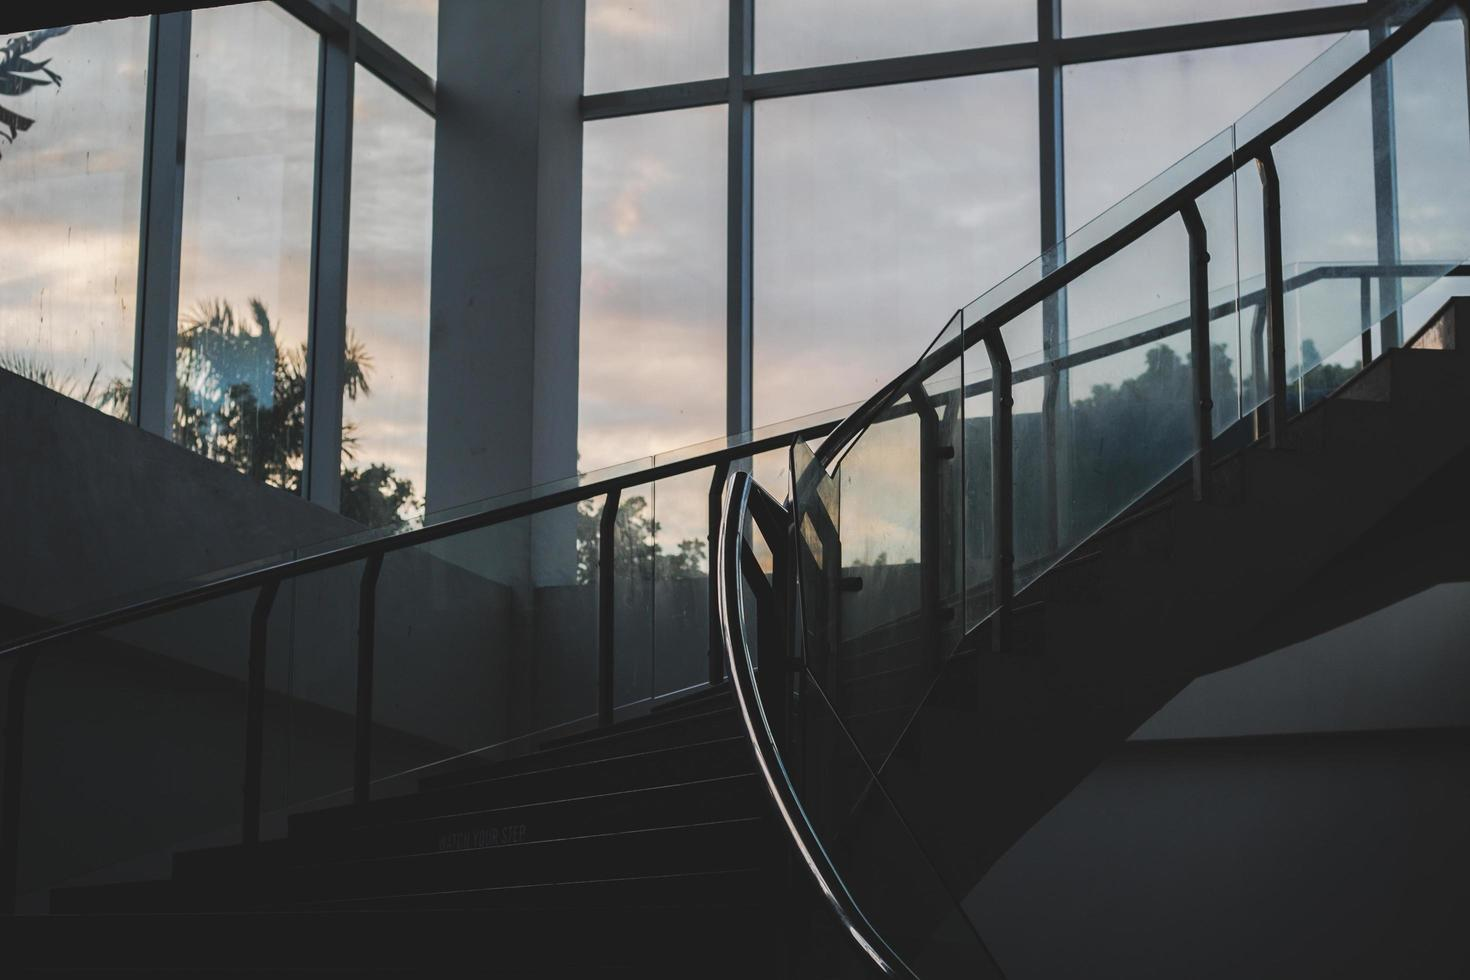 Interior staircase at dawn photo